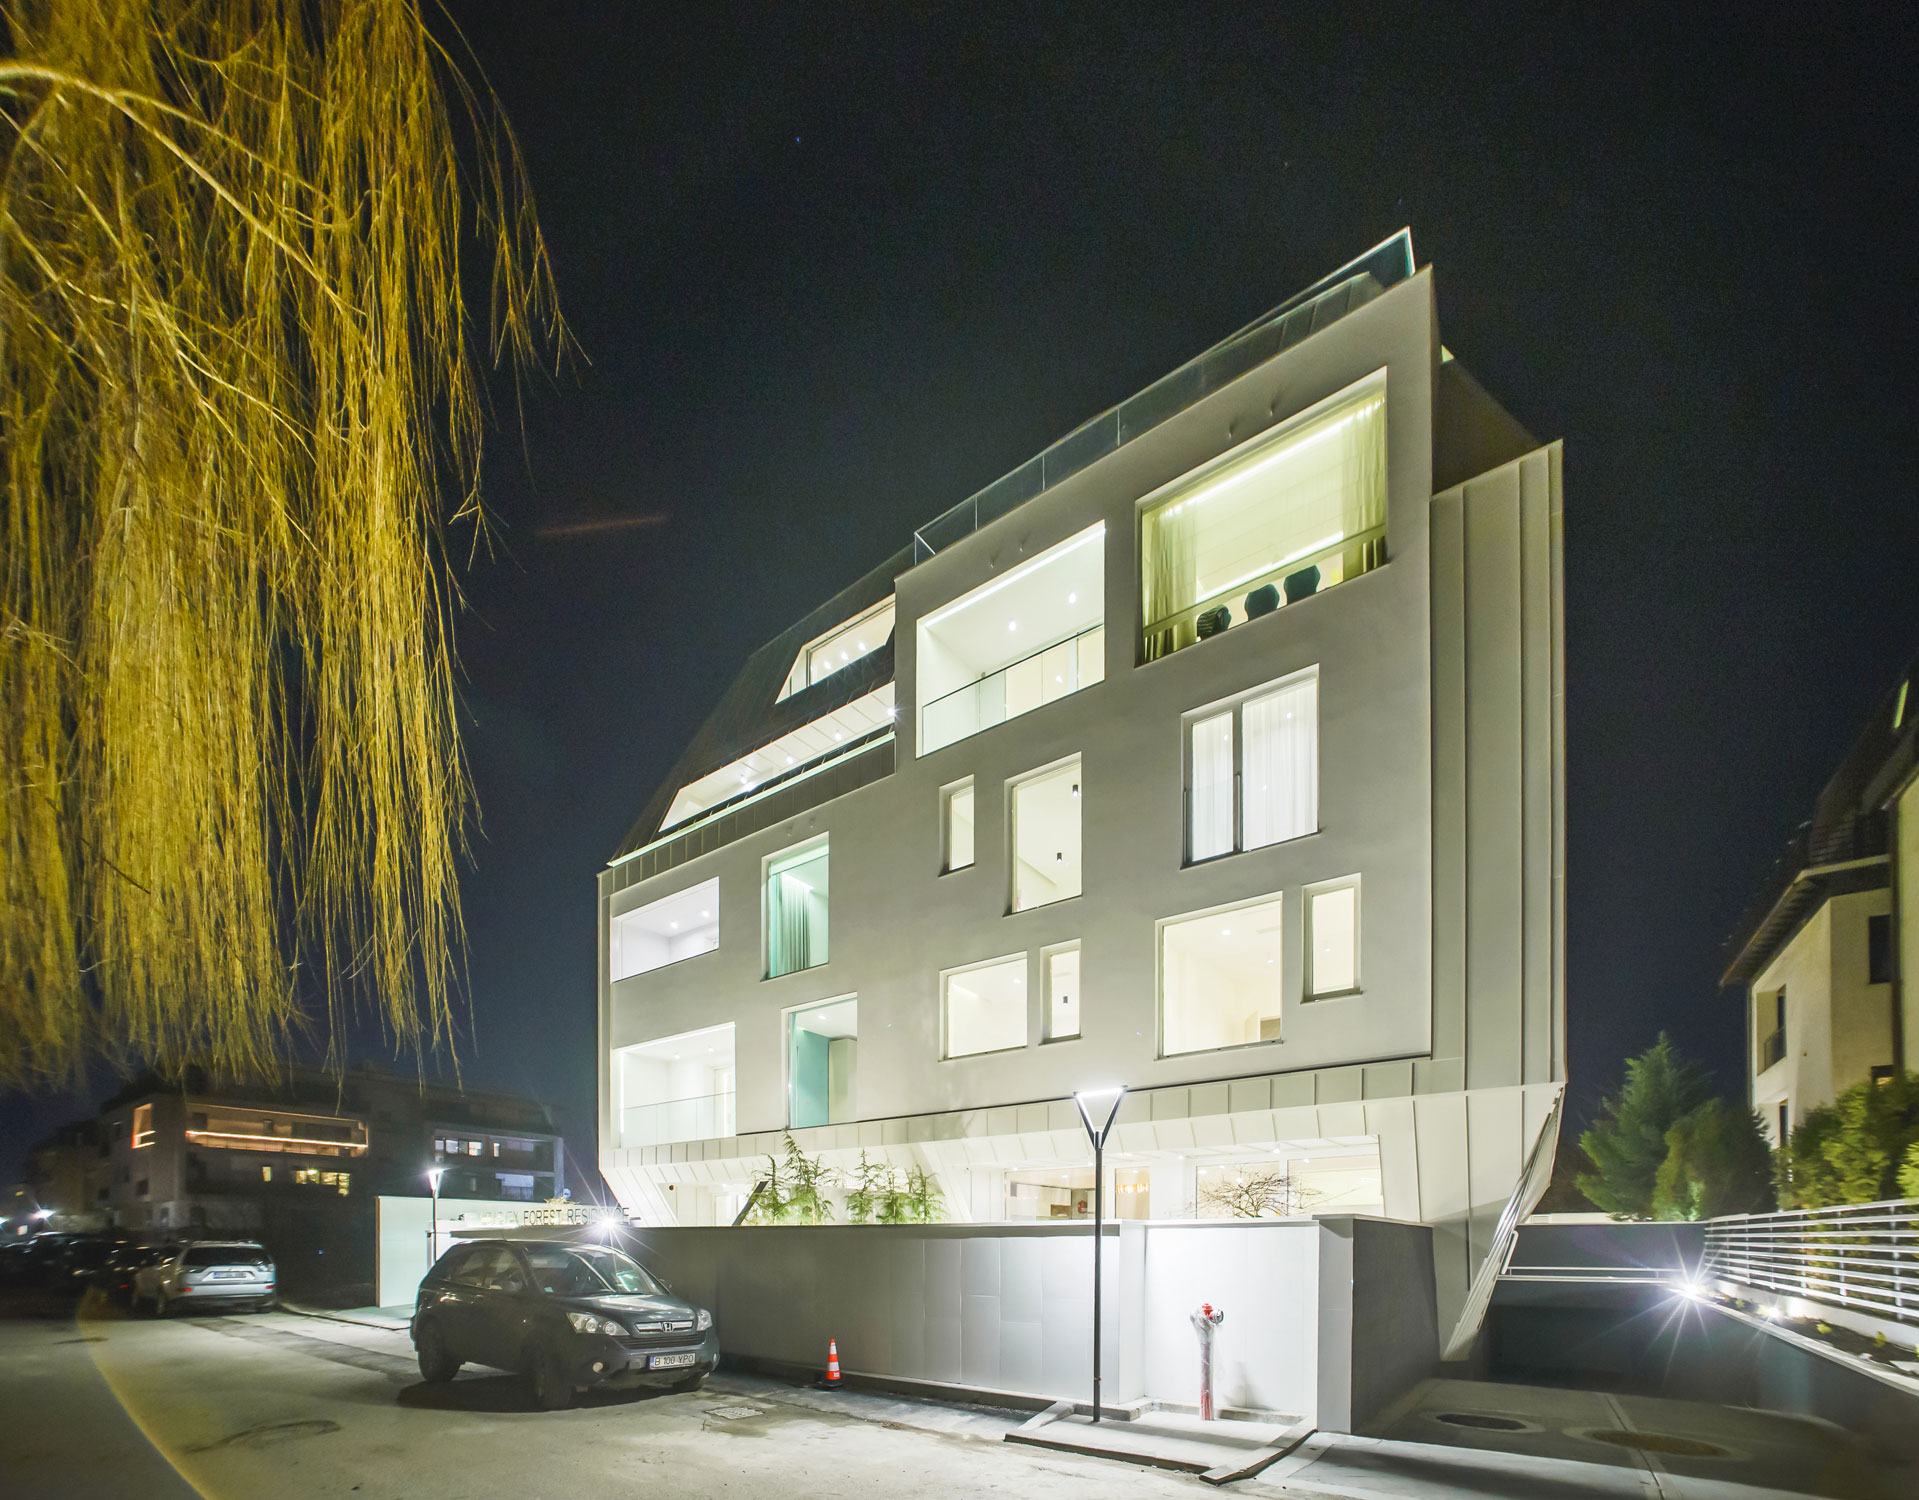 https://nbc-arhitect.ro/wp-content/uploads/2020/10/NBC-Arhitect-_-residential-_-Duplex-Forest-Residence-_-Romania_47.jpg